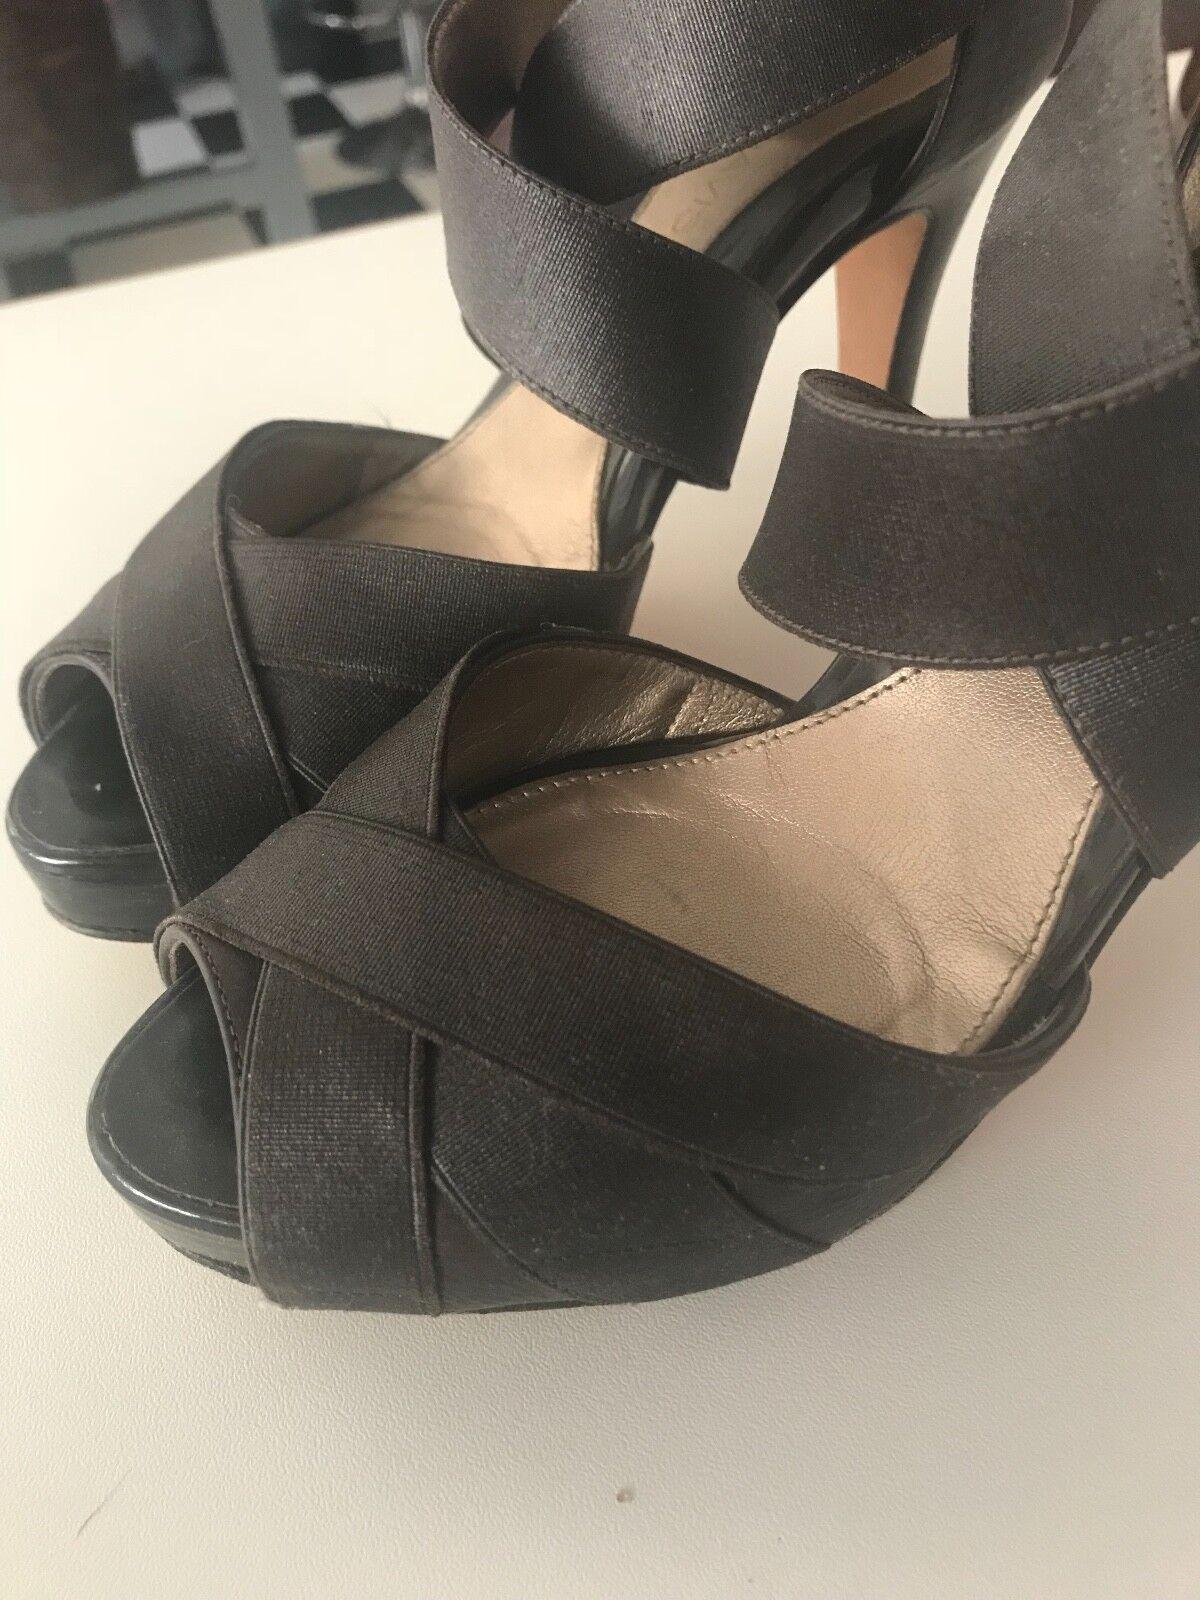 DANA DANA DANA DAVIS  Lola  Peep-Toe Platform Dark Brown Sandal - 7.5 5f2279